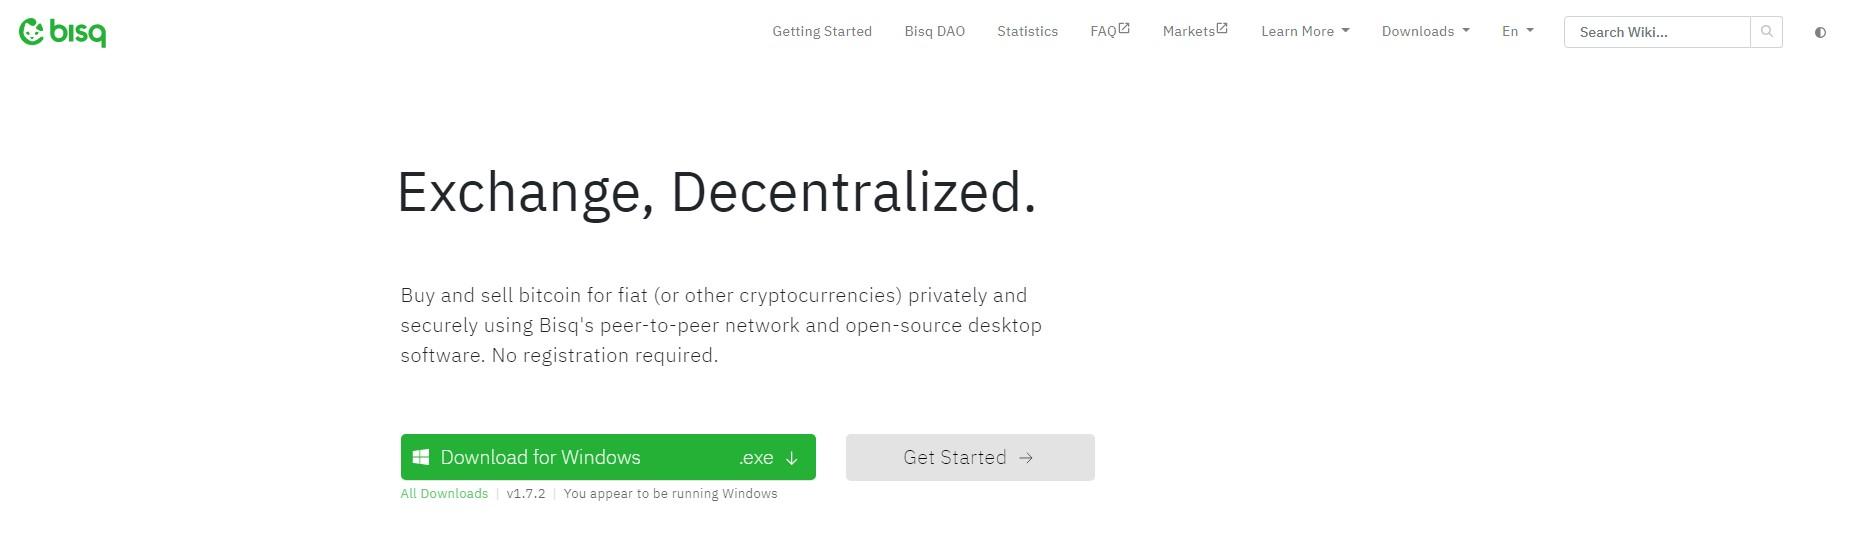 Bisq network homepage